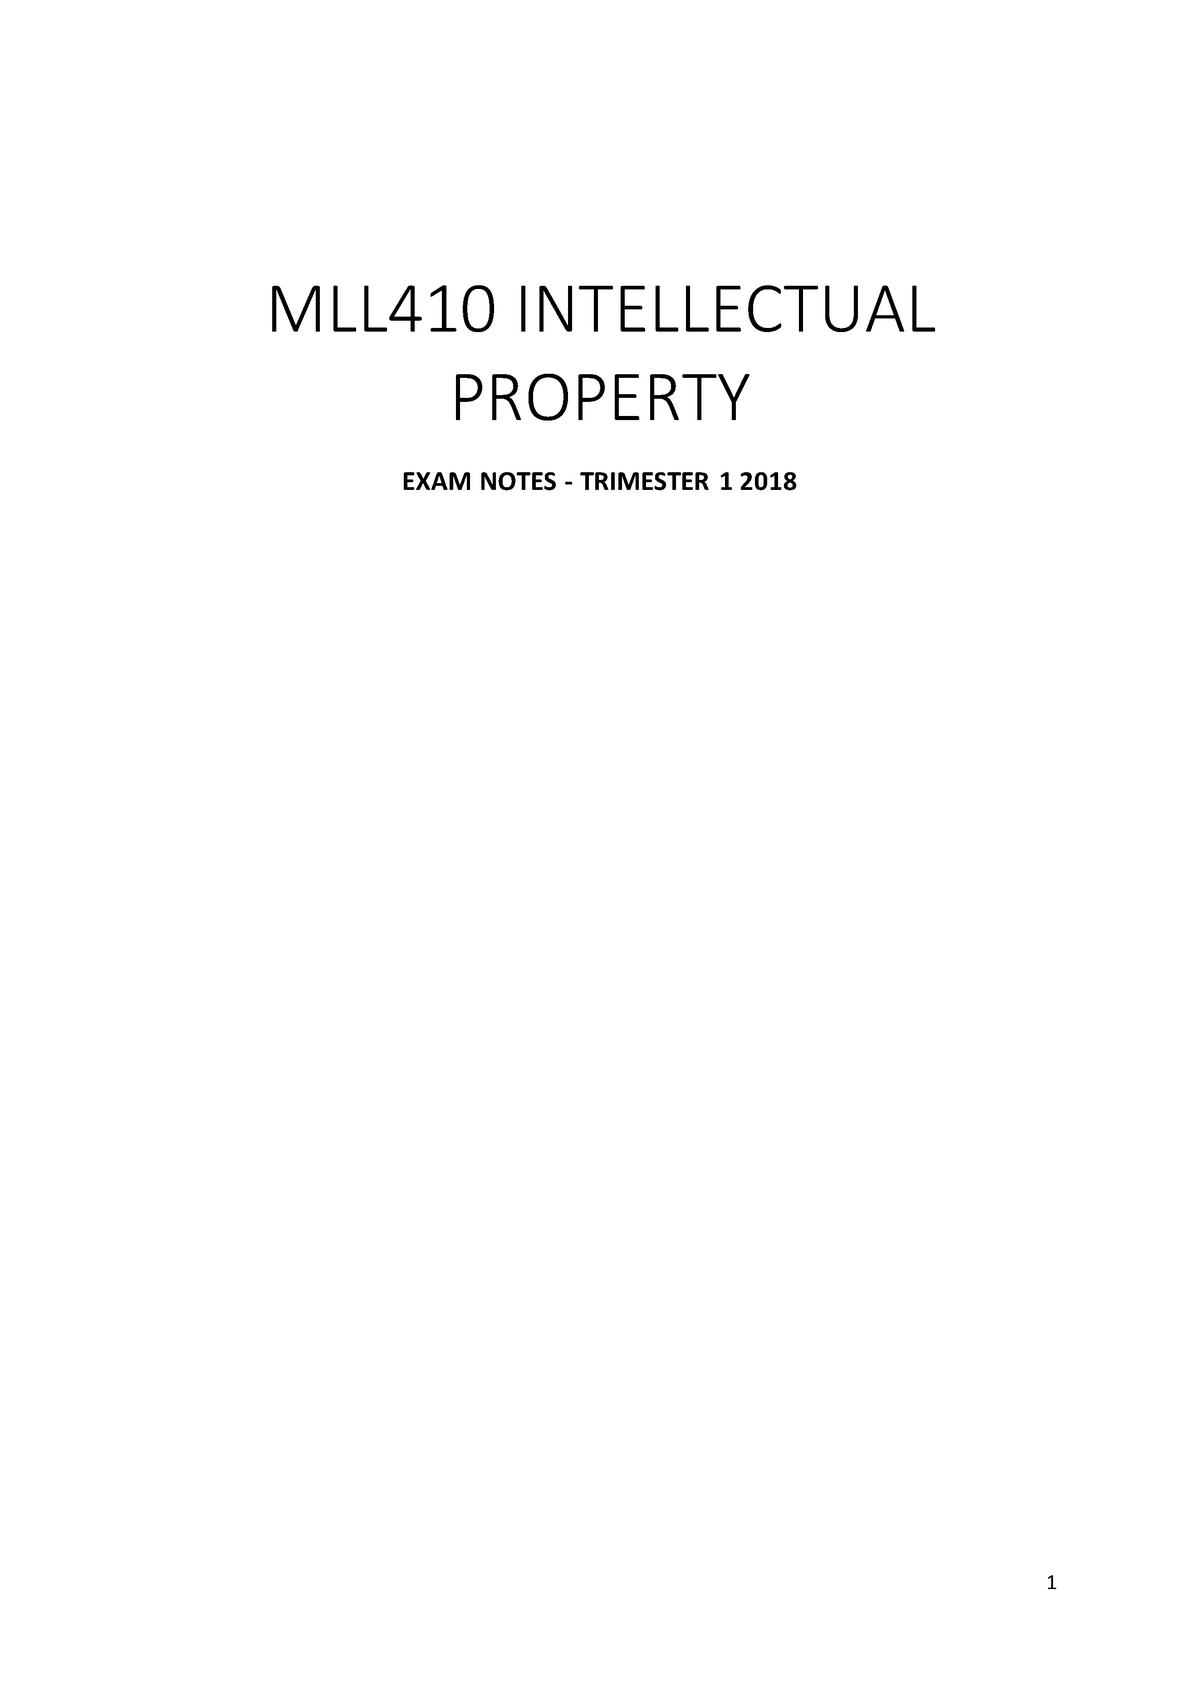 HD Intellectual Property exam notes - MLL410 - Deakin - StuDocu